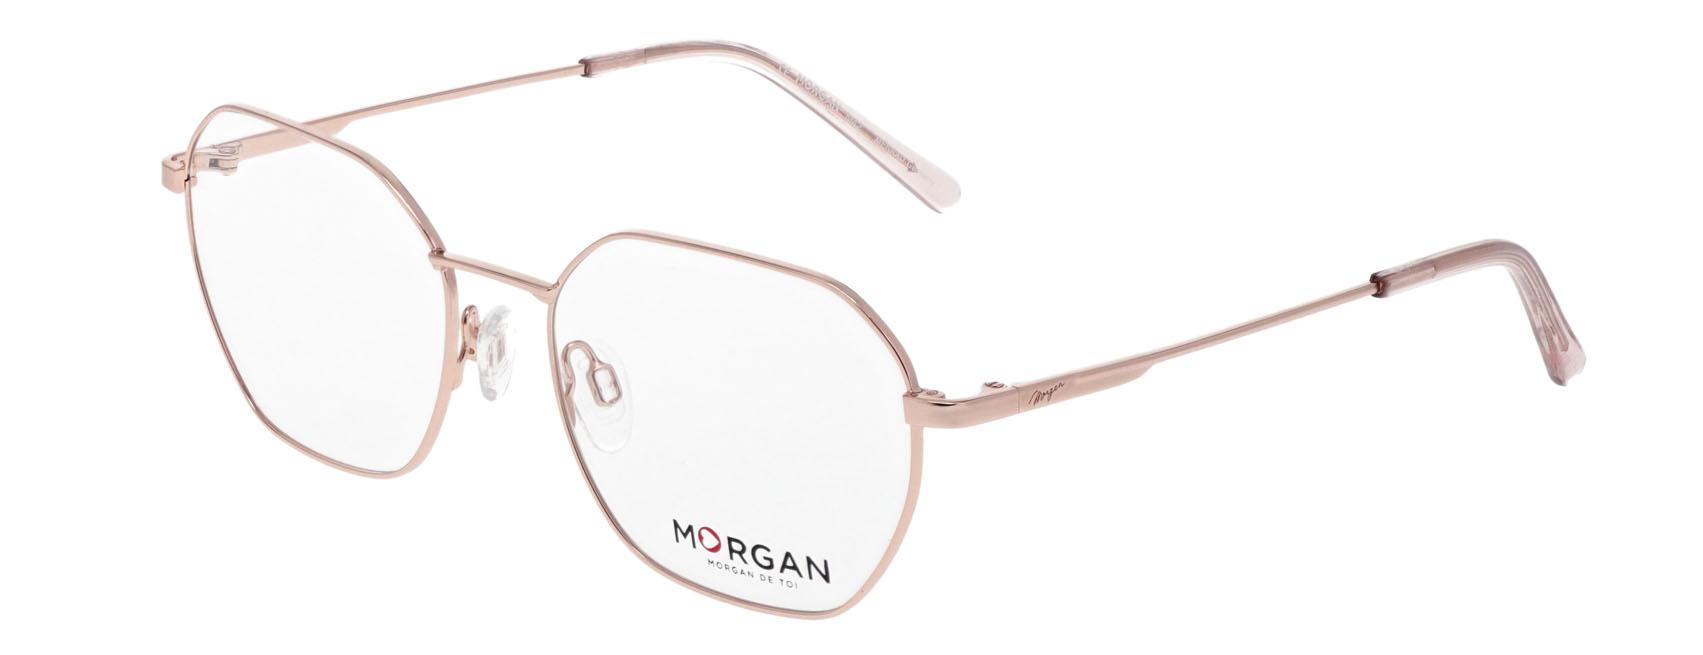 Morgan 203210 7100